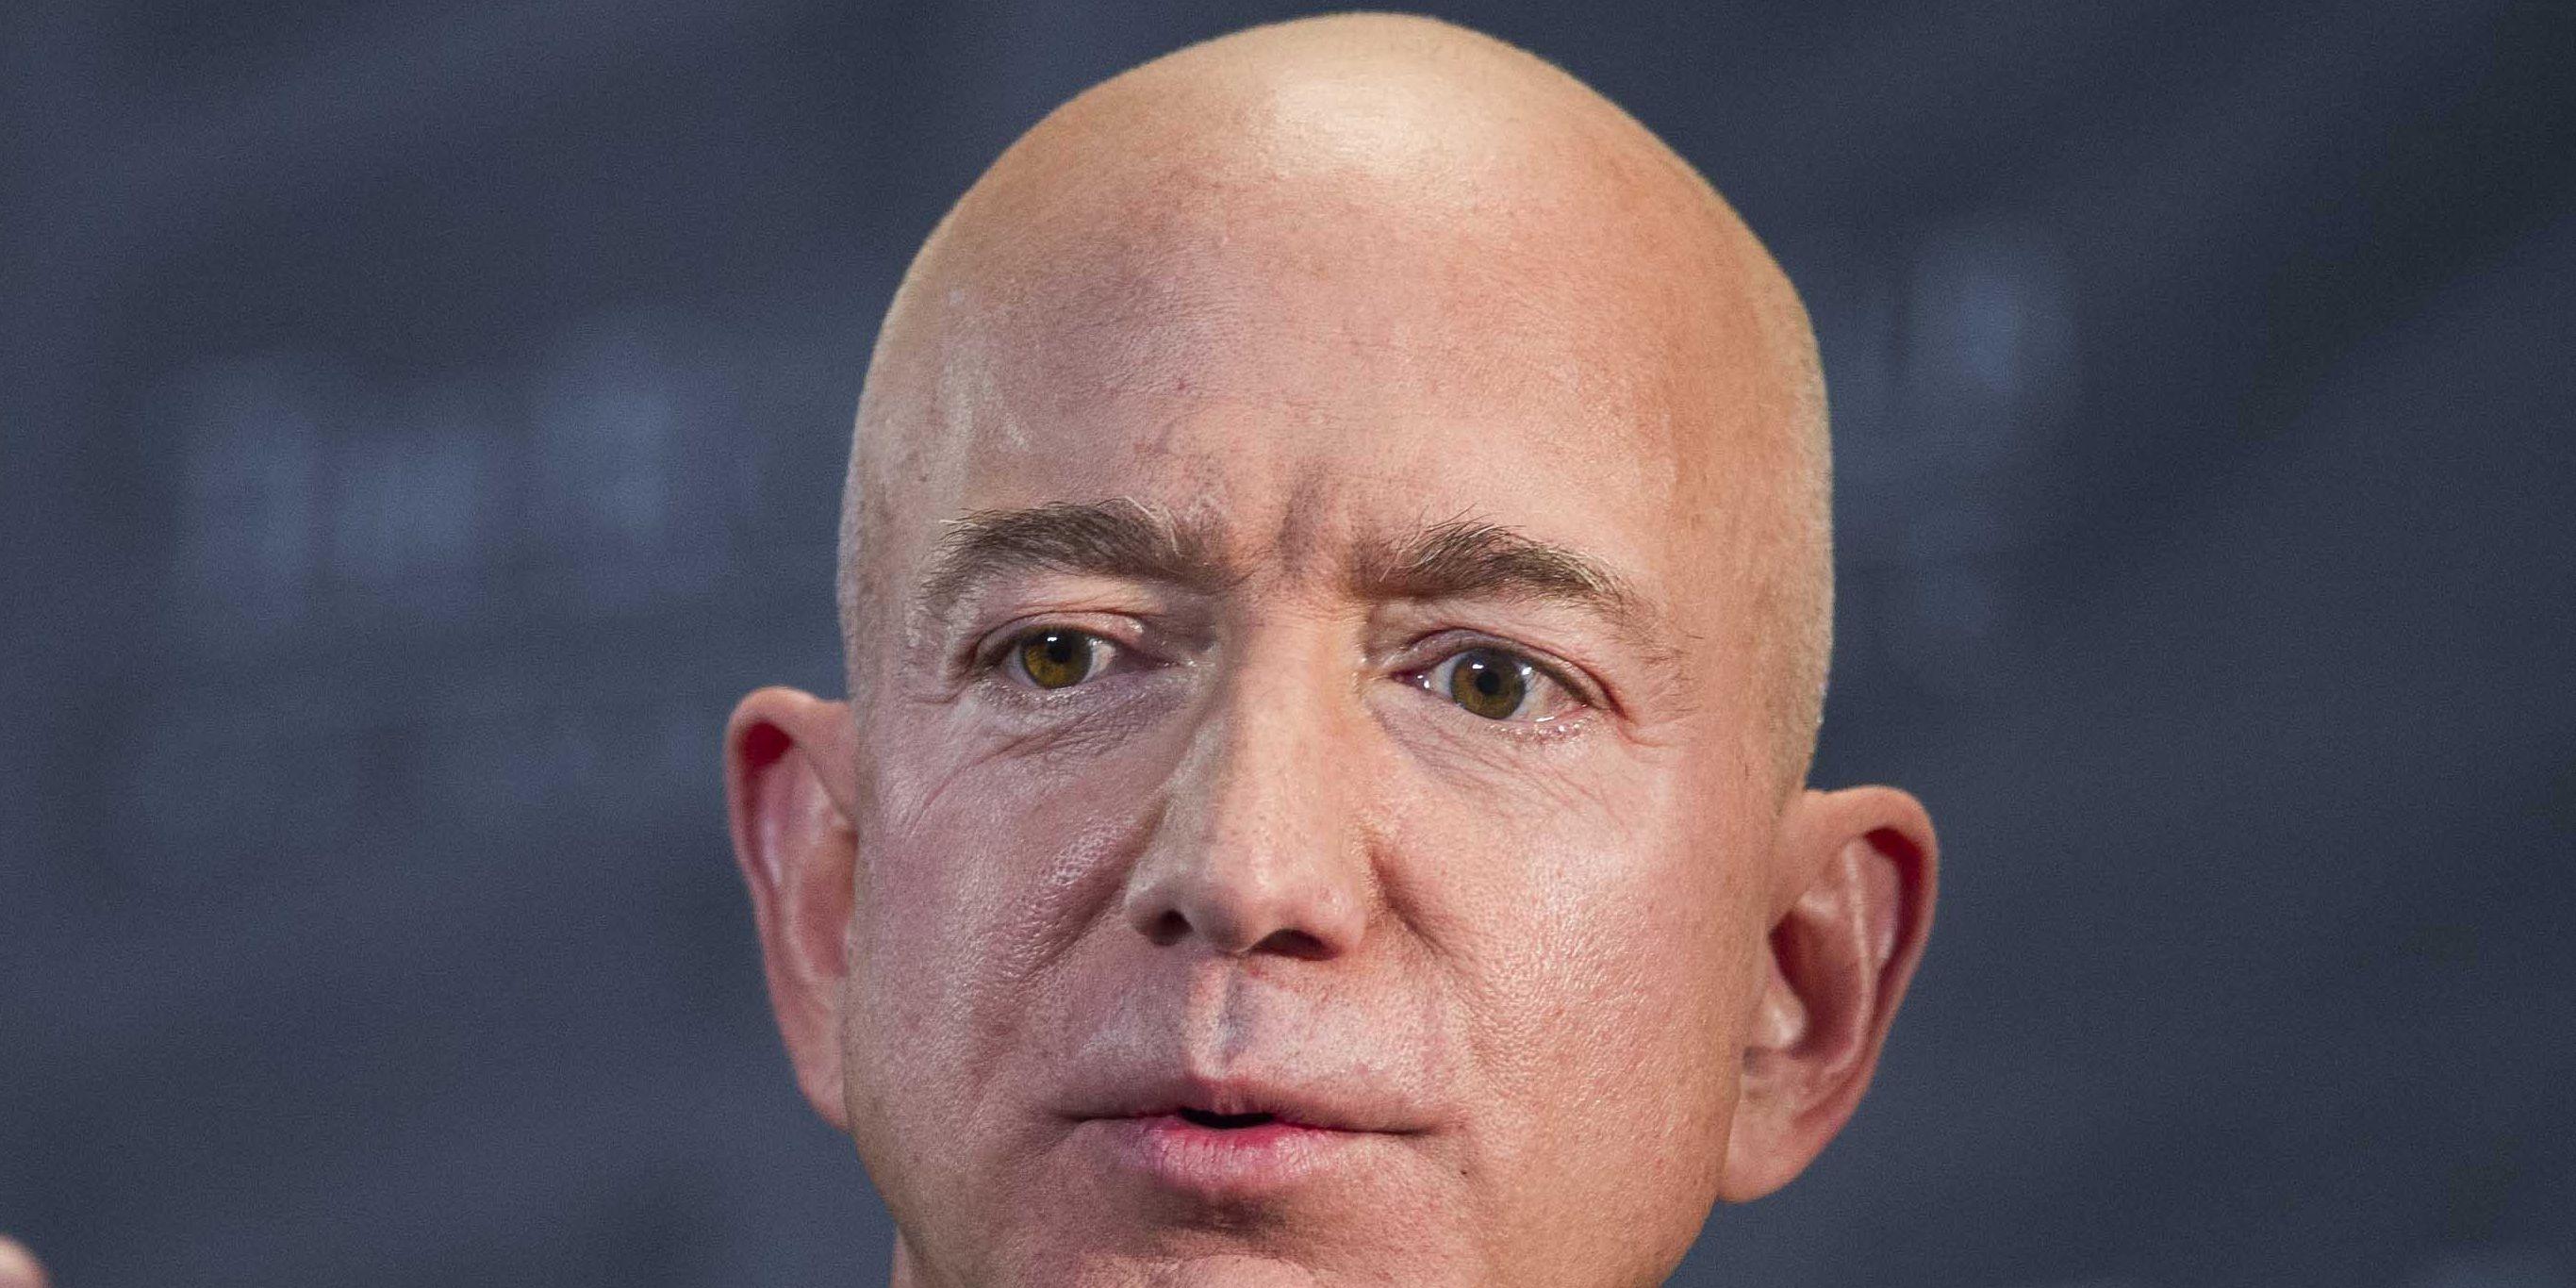 Bezos says Enquirer threatened to publish revealing pics